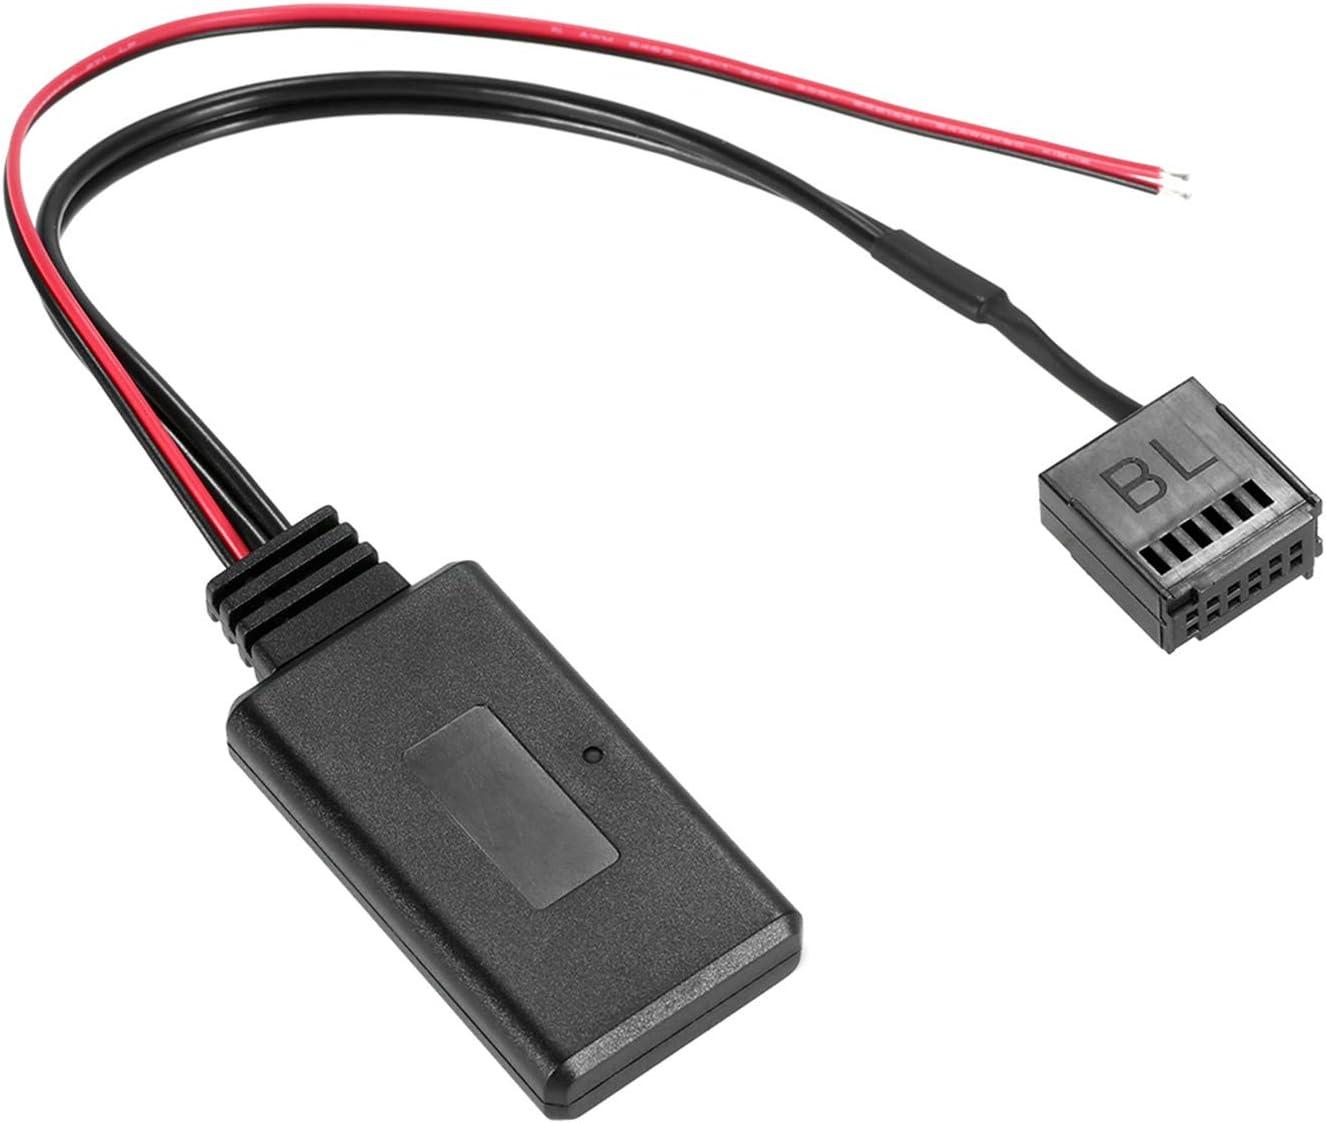 Lechnical Coche Adaptador de Radio AUX-IN Cable inal/ámbrico BT M/ódulo de reemplazo para Ford Focus Mondeo 6000 CD